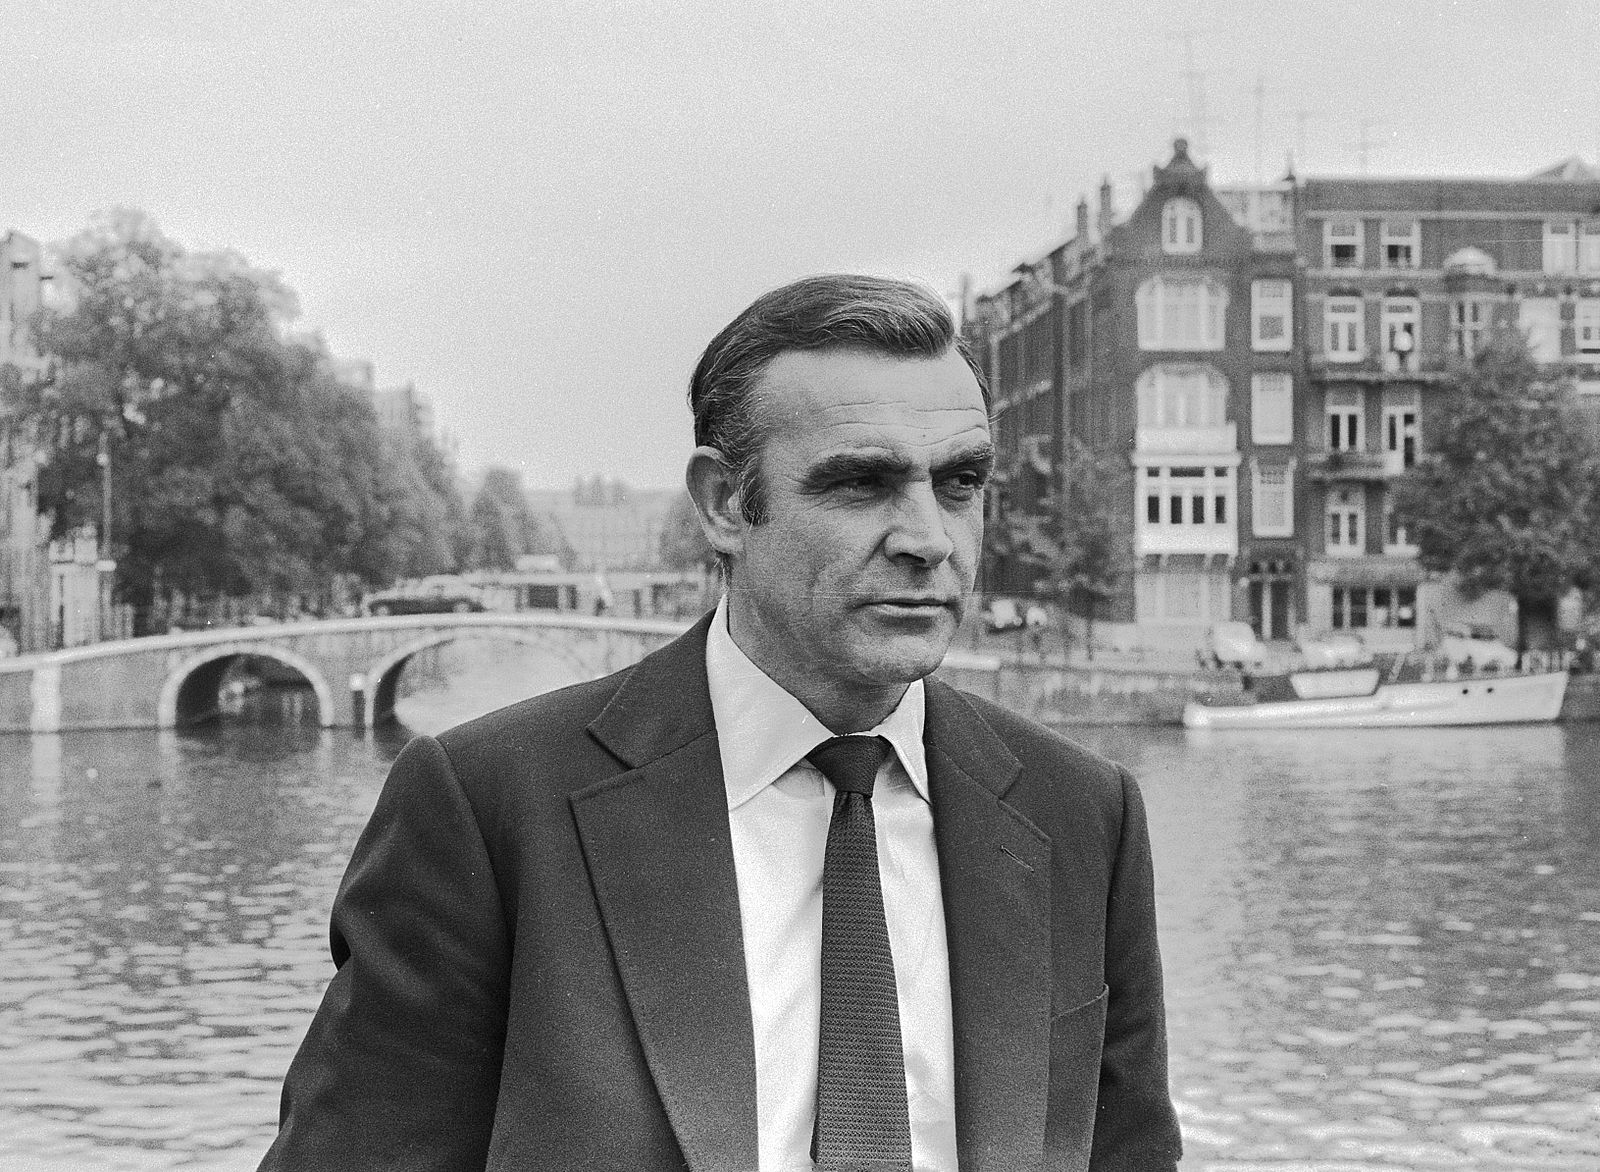 Bond, James Bond, Video, Grant, Ron Chernow,